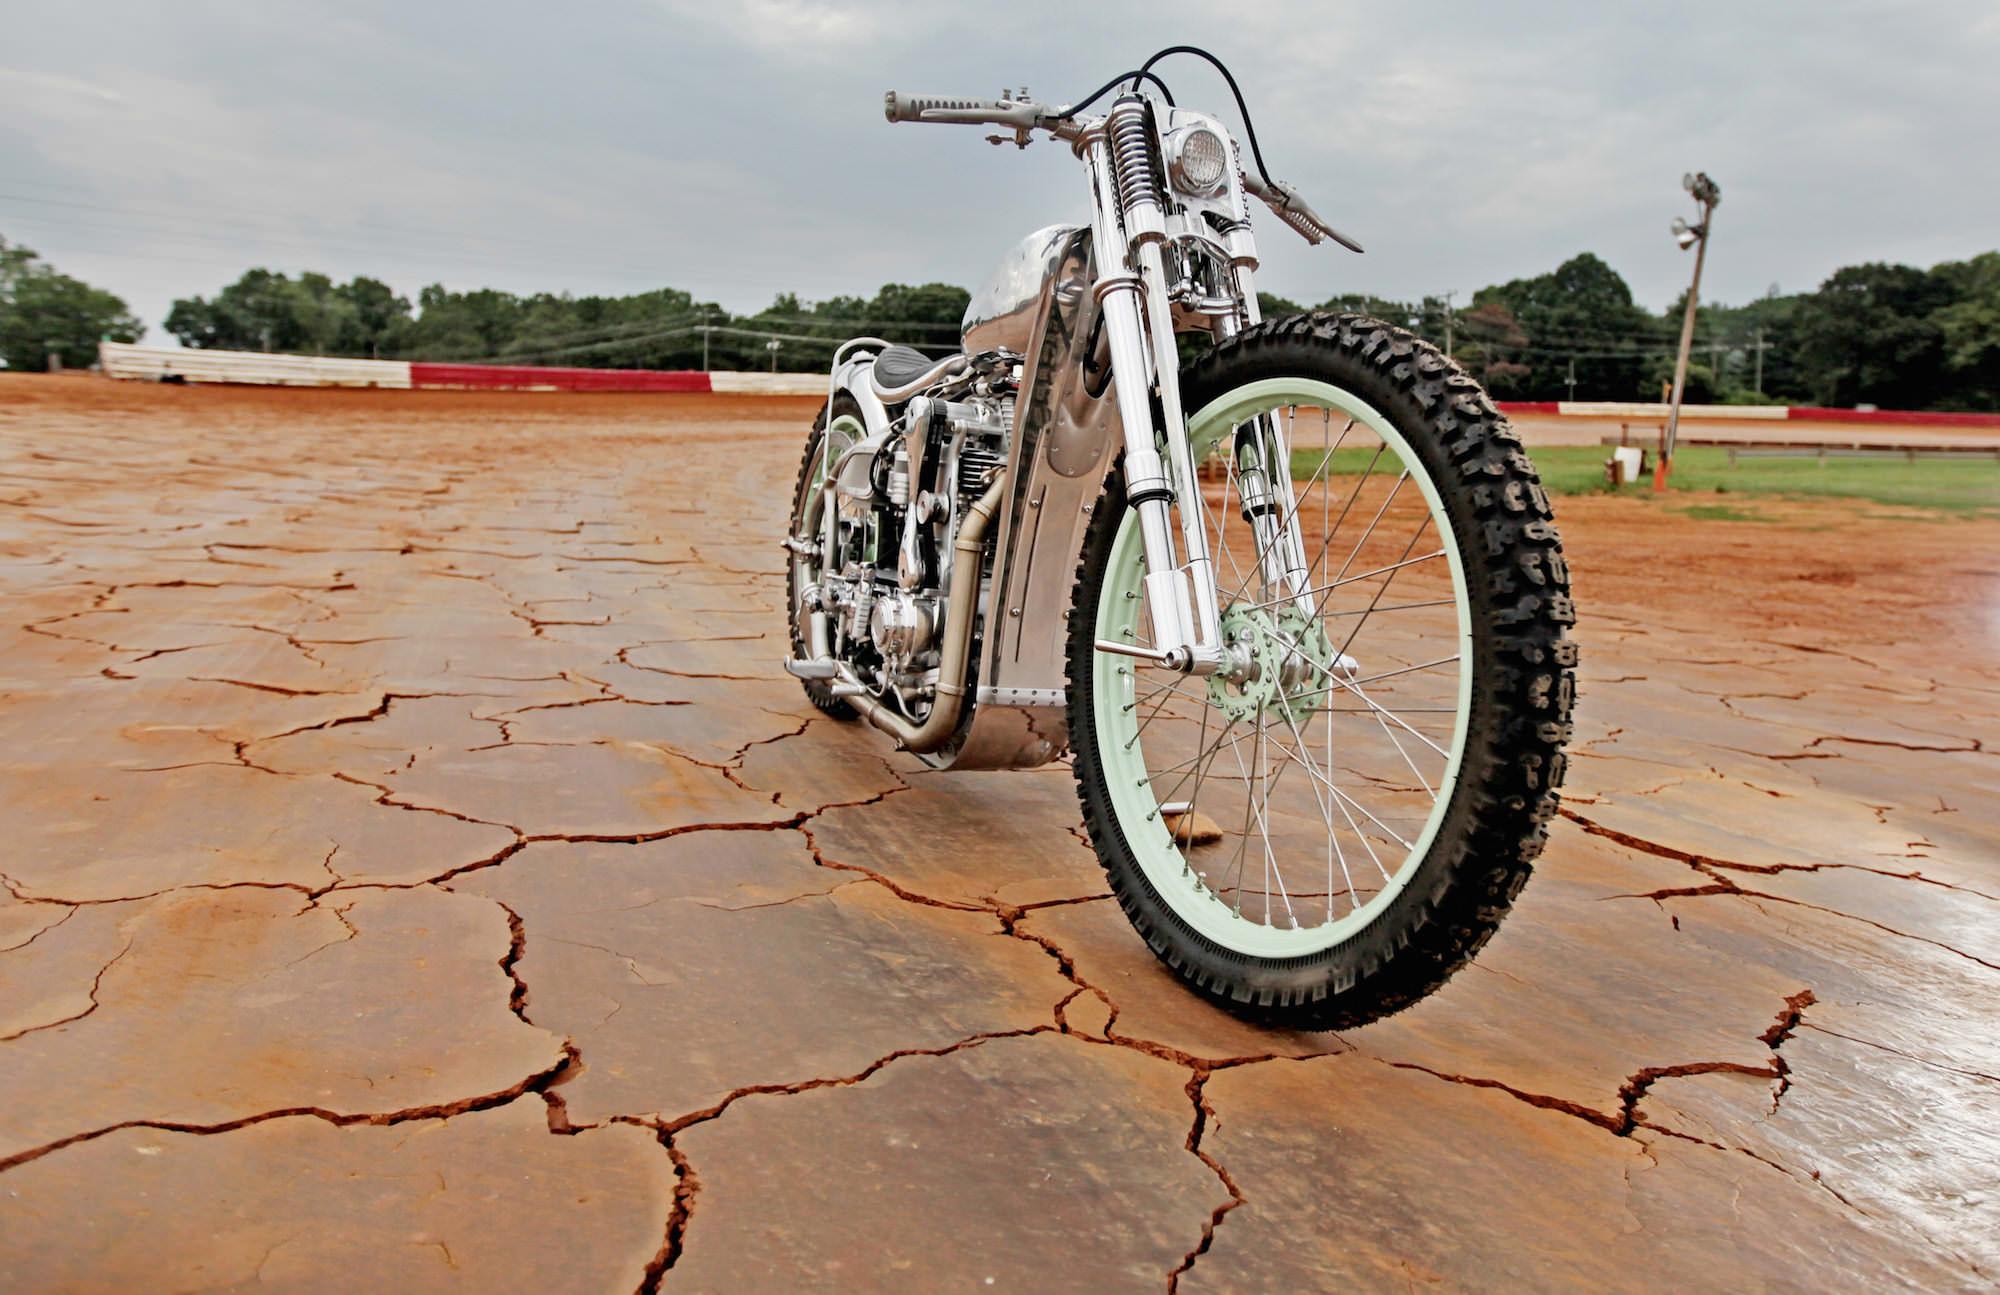 Custom-Buell-Ducati-Motorcycle-27